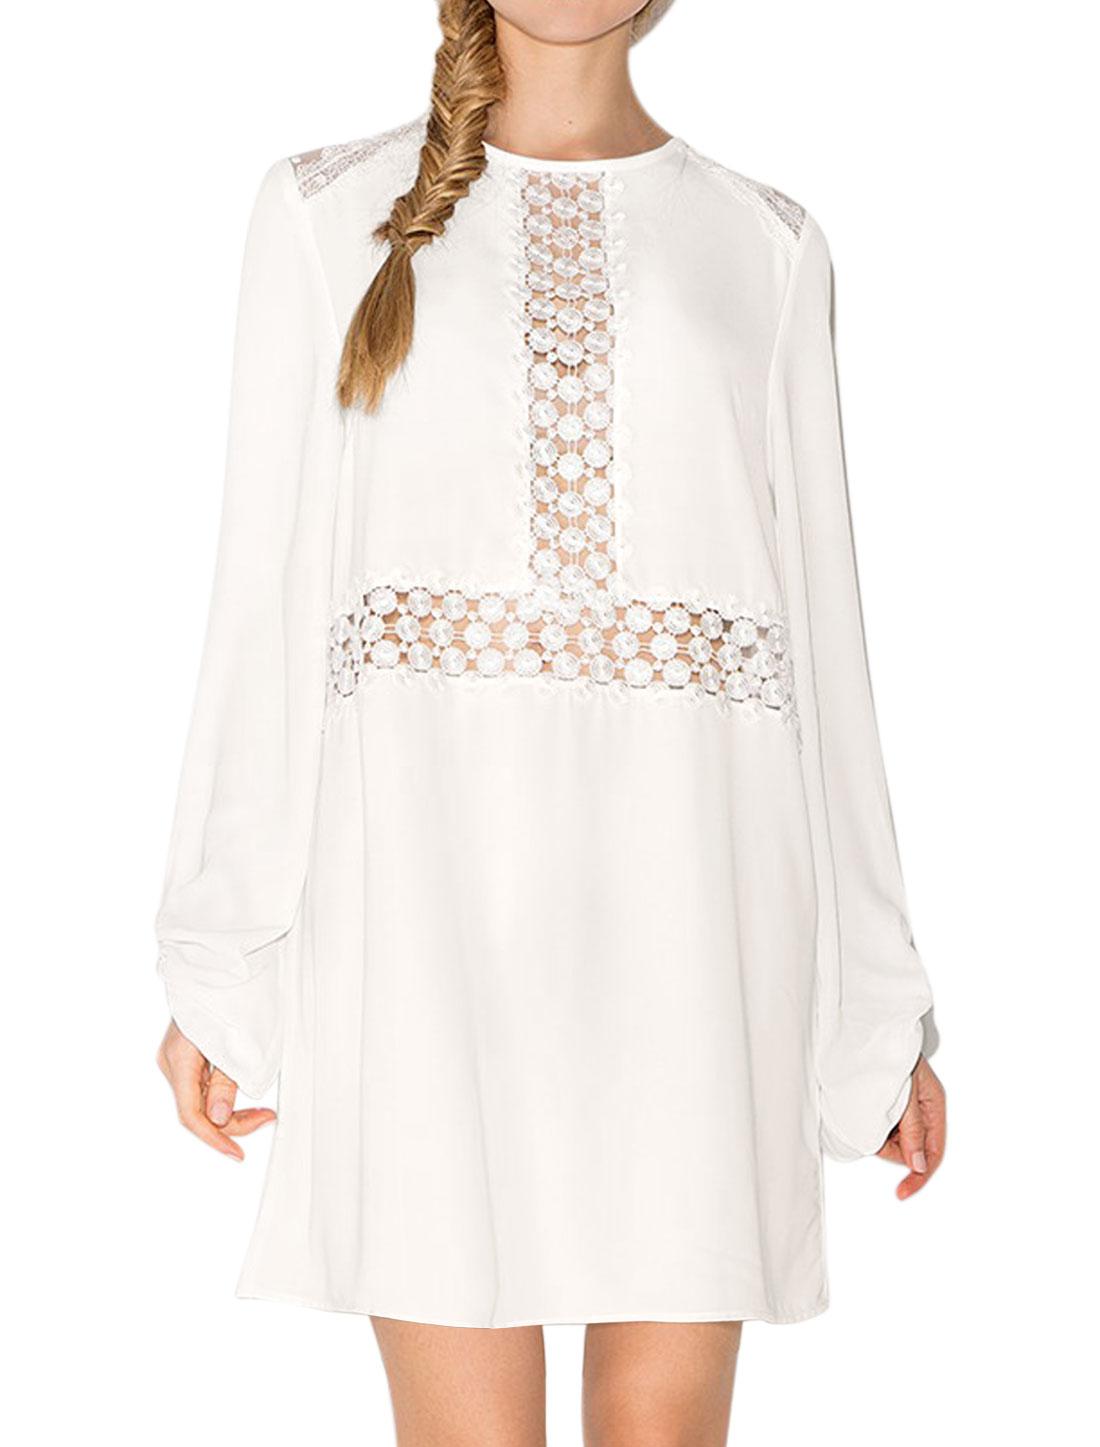 Women Crochet Mesh Panel Hollow Out Keyhole Tunic Dress White S